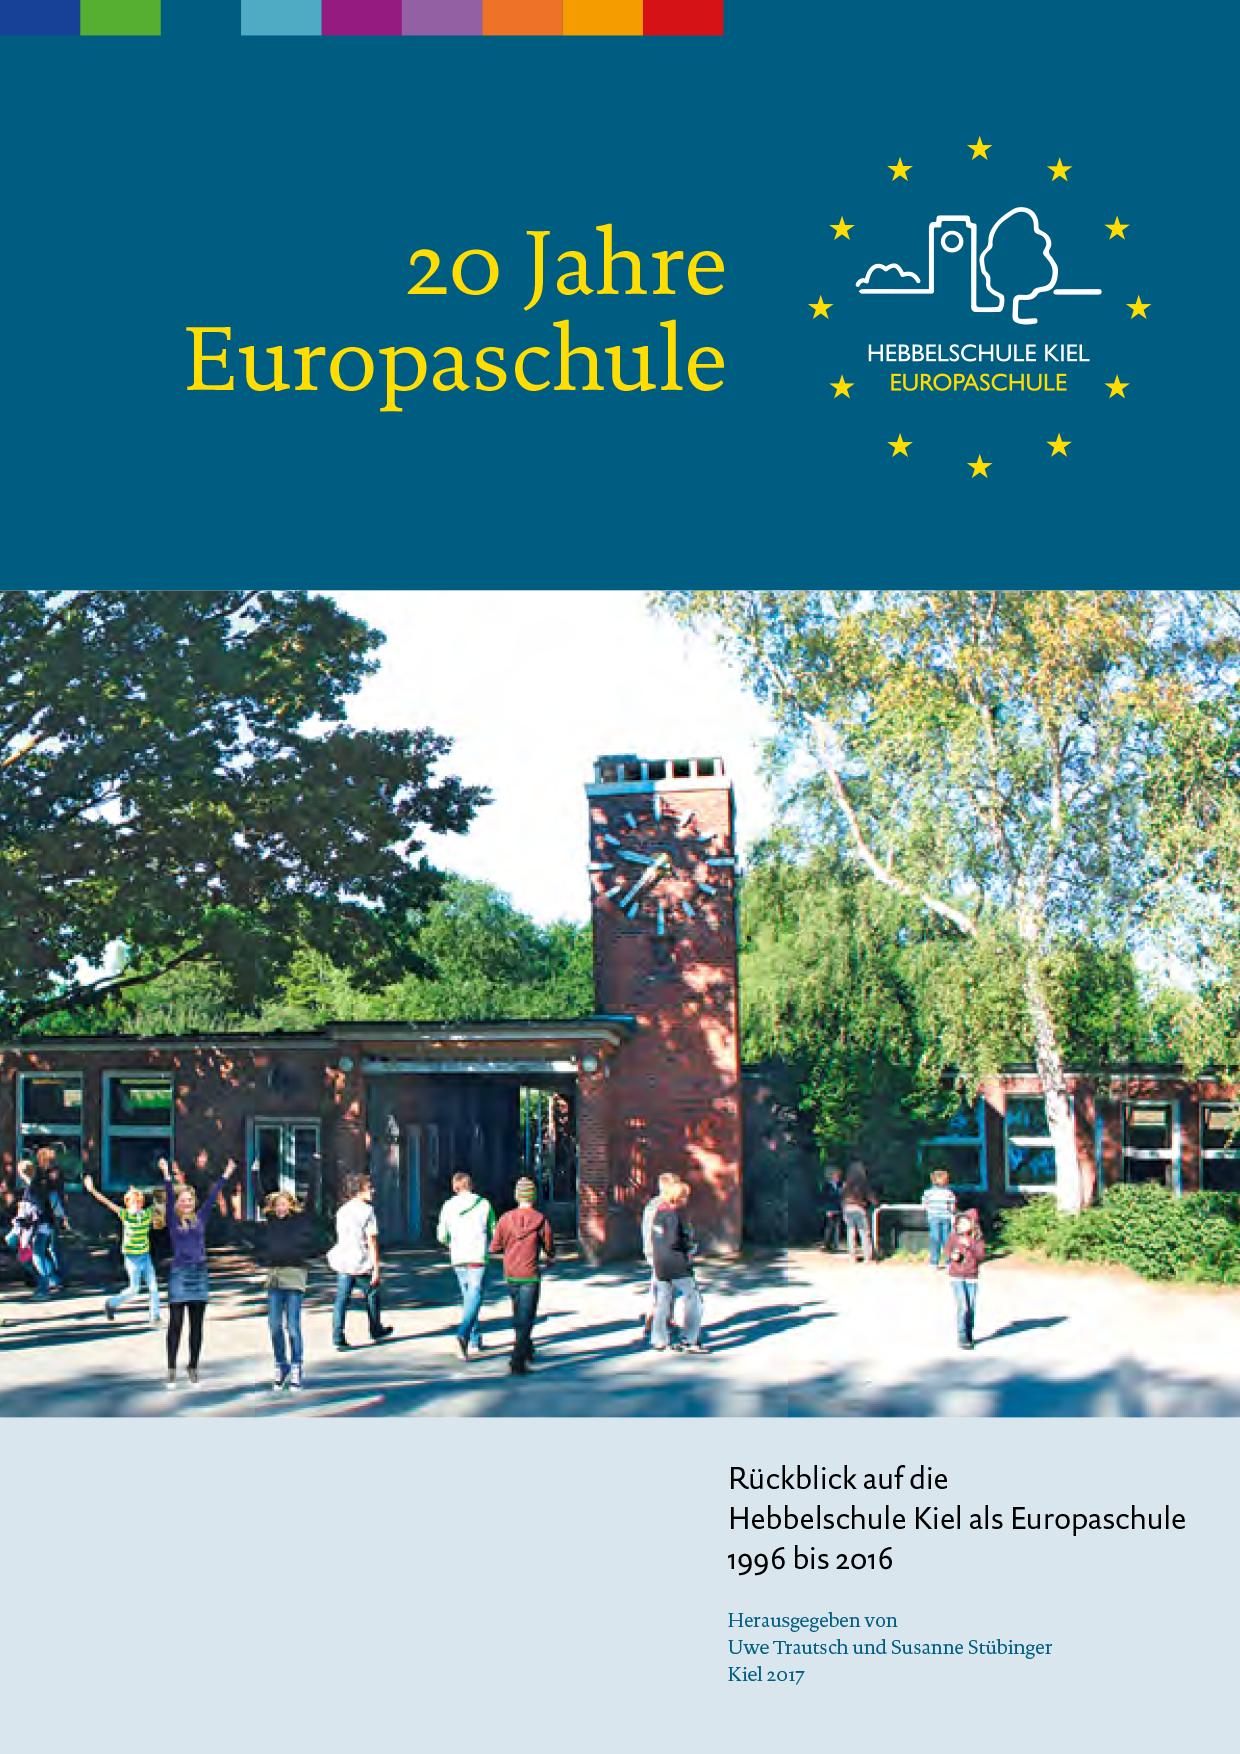 20 Jahre Europaschule die Festchronik der Hebbelschule